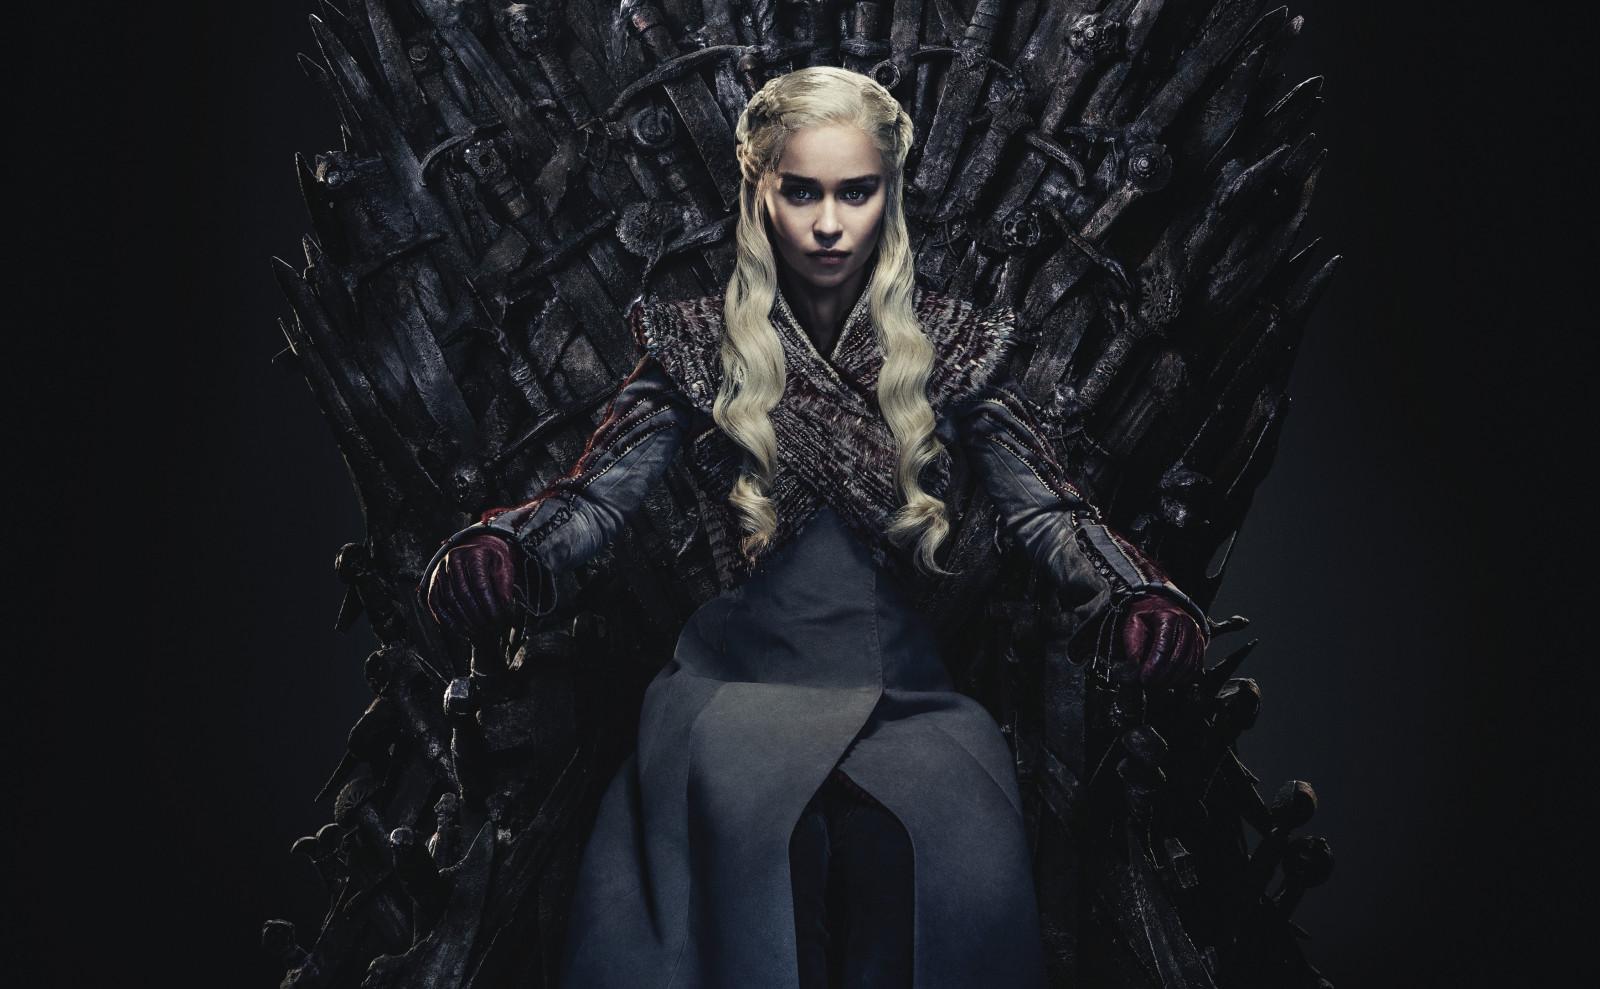 Daenerys_Targaryen_Emilia_Clarke_Game_of